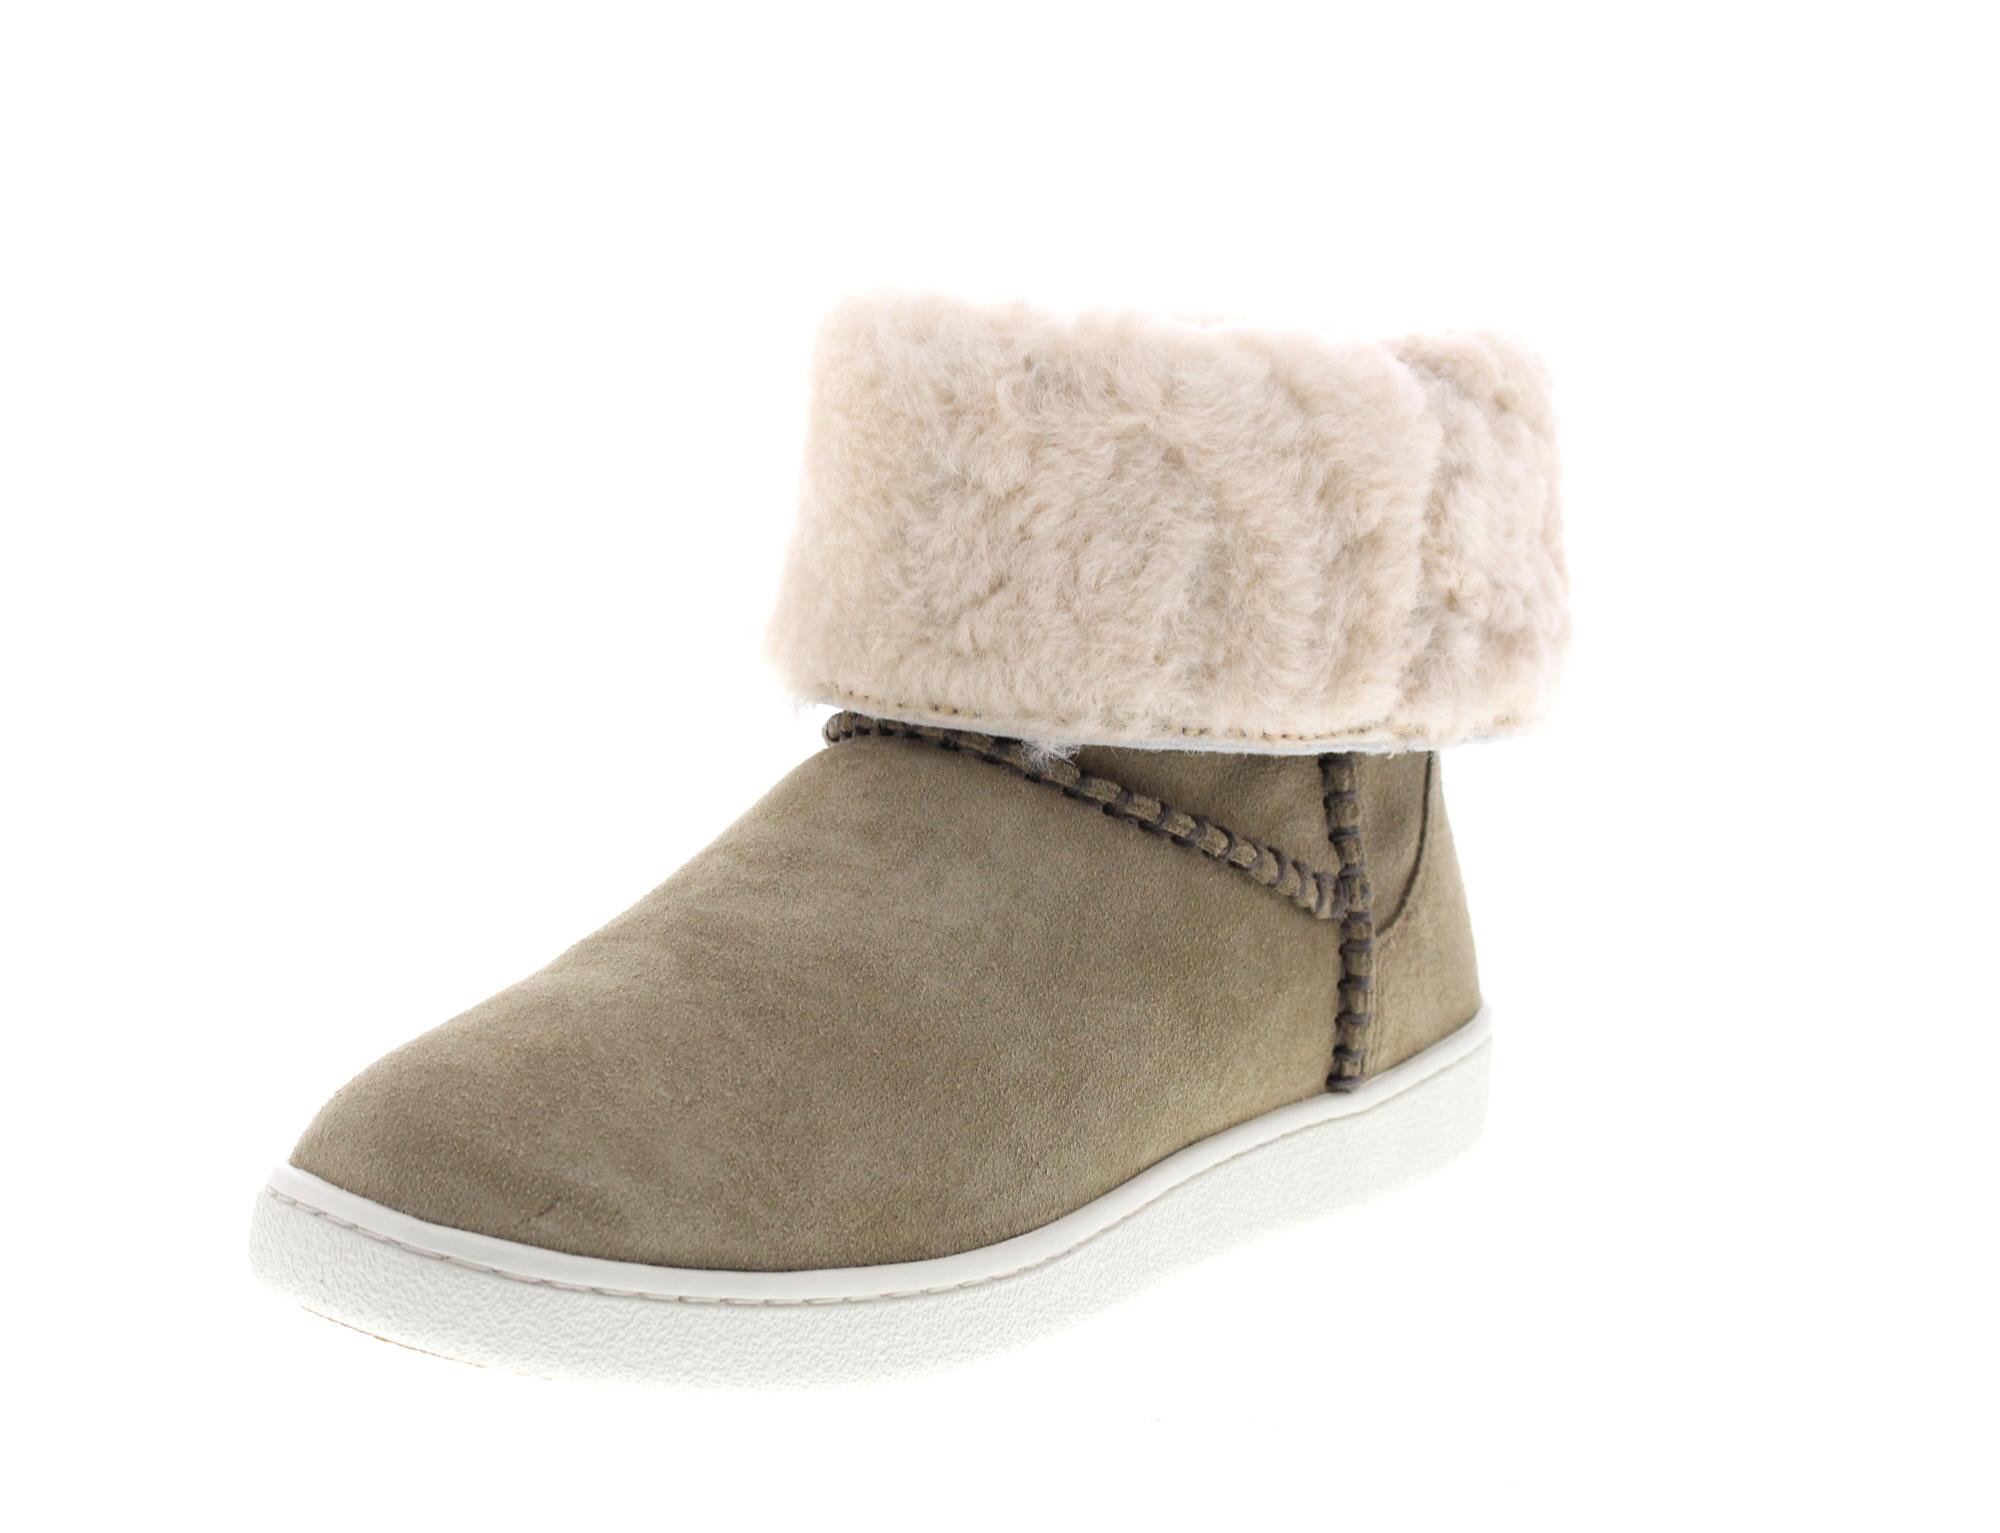 UGG Damenschuhe Booties MIKA CLASSIC SNEAKER - antilope0-6791